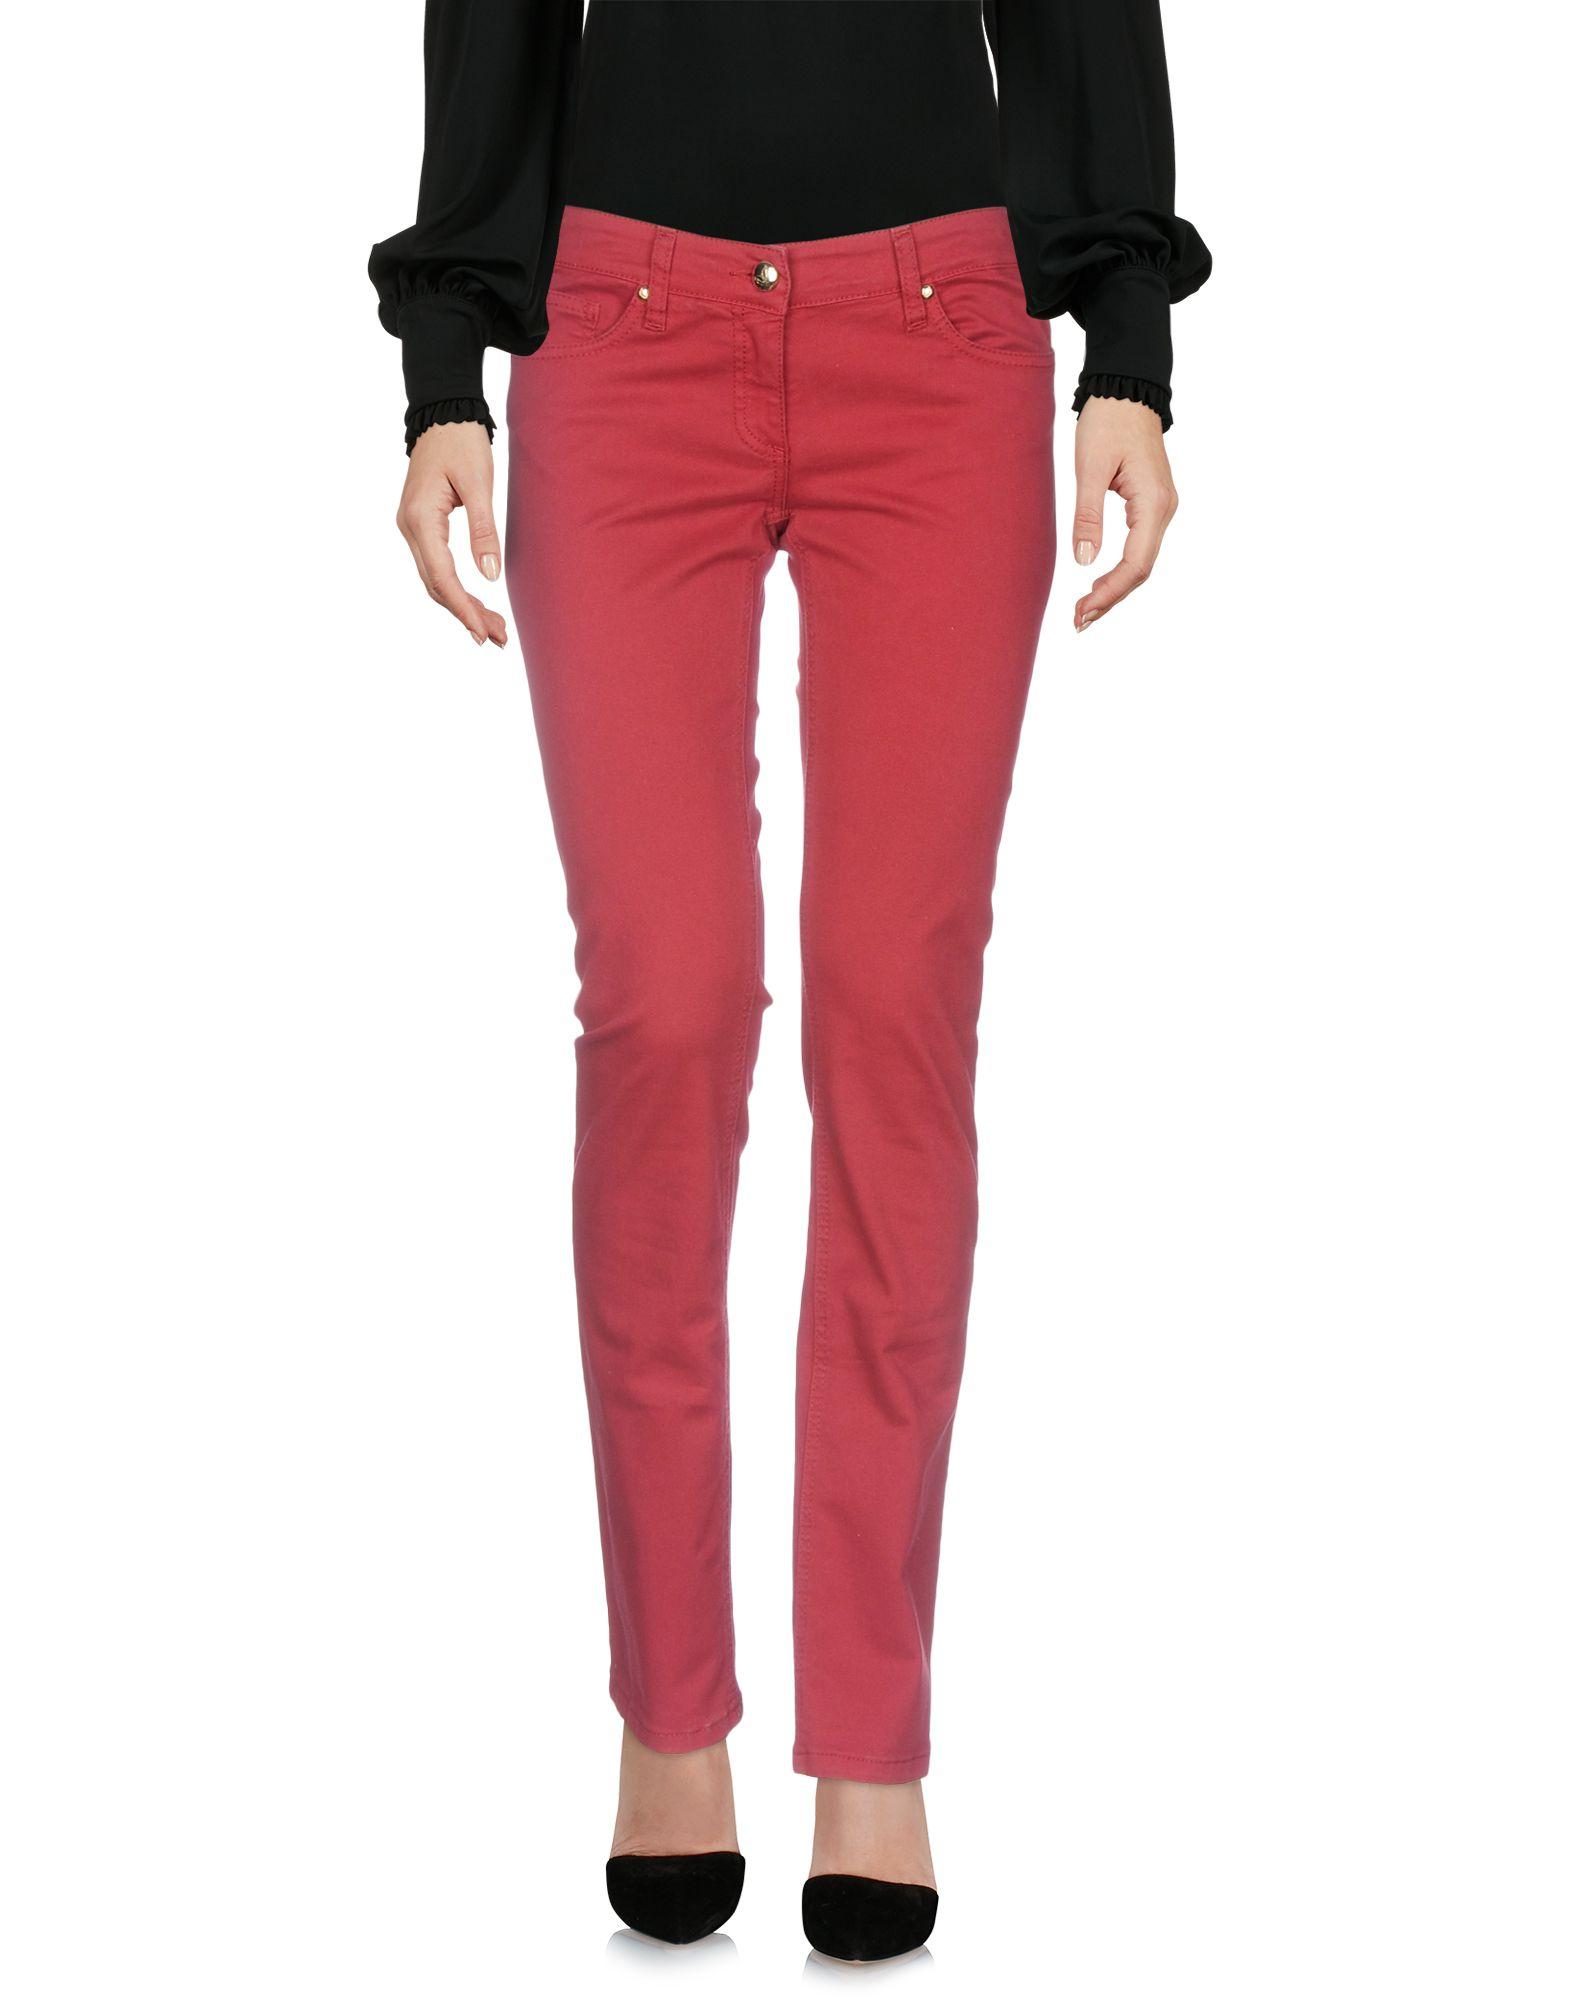 Pantalone Betty blu donna donna donna - 13179856ES f2e